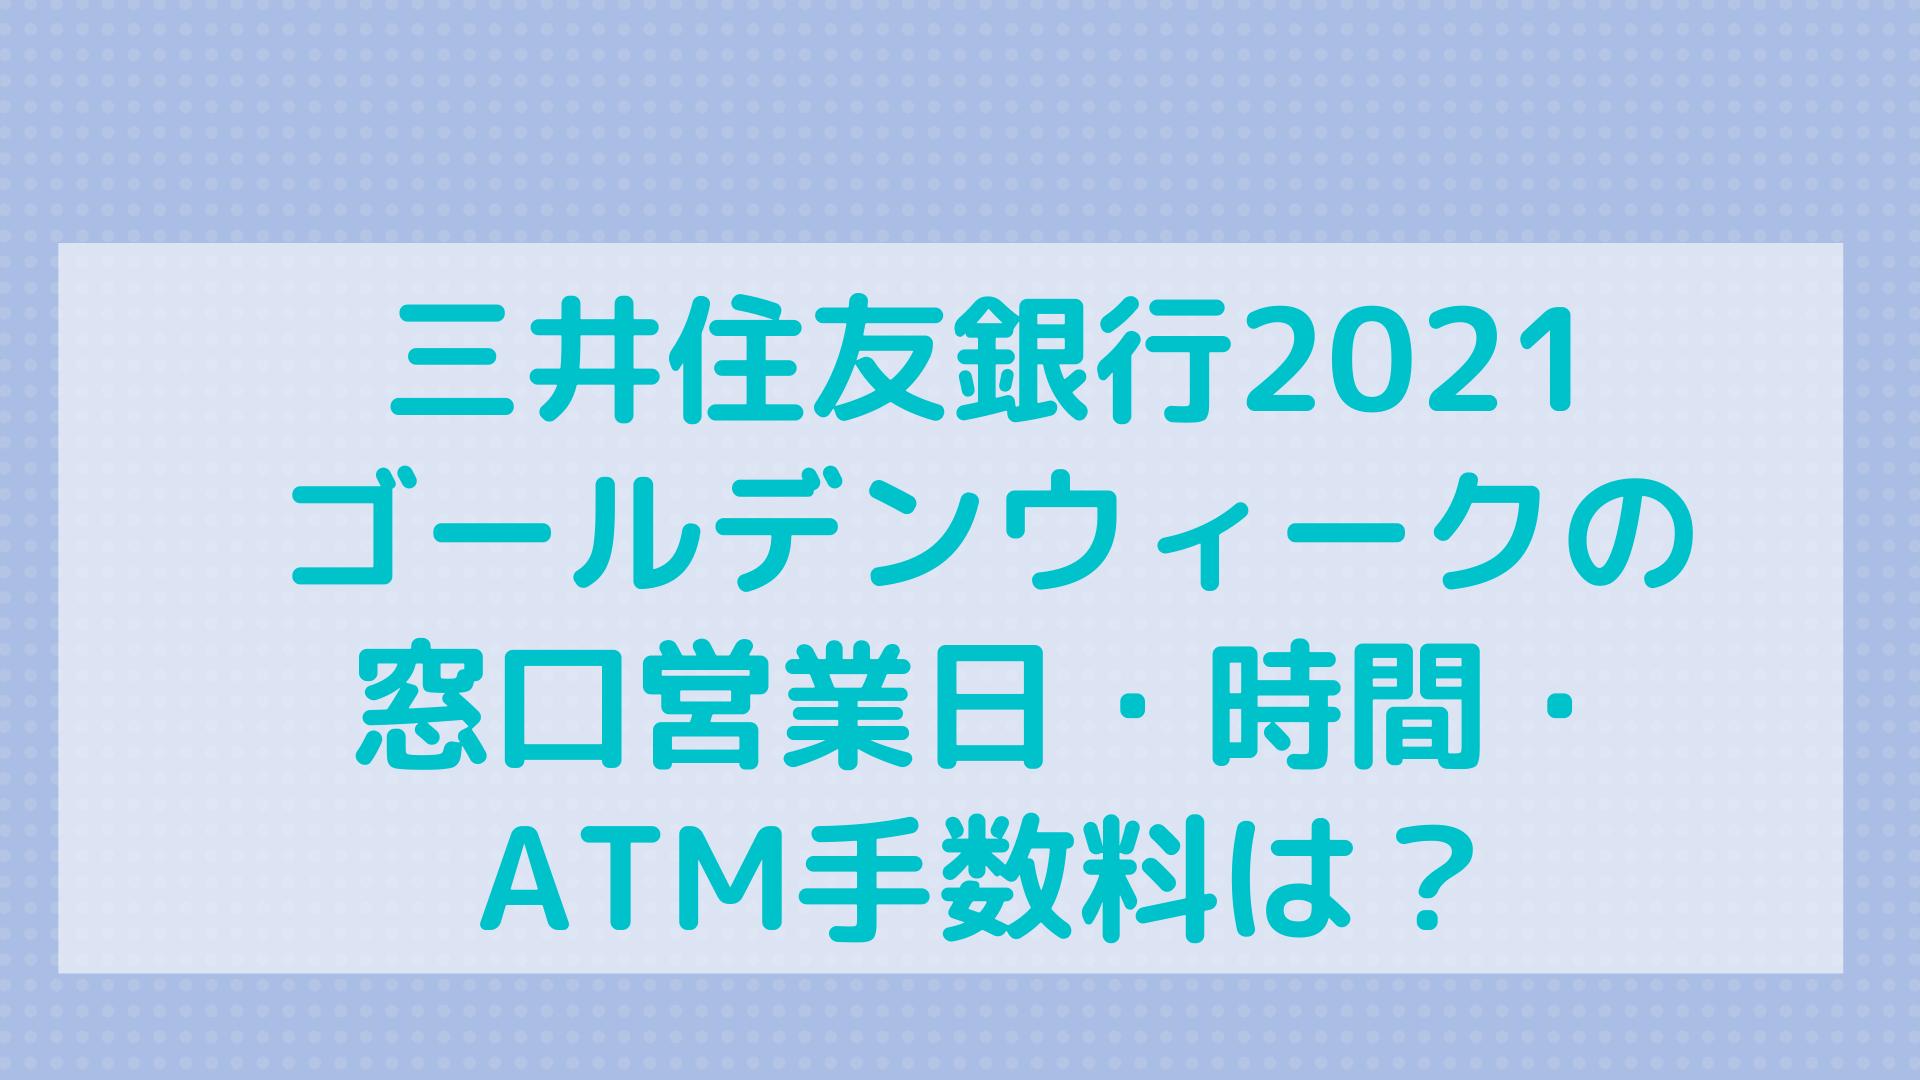 Atm gw ゆうちょ ATM・CD提携サービス